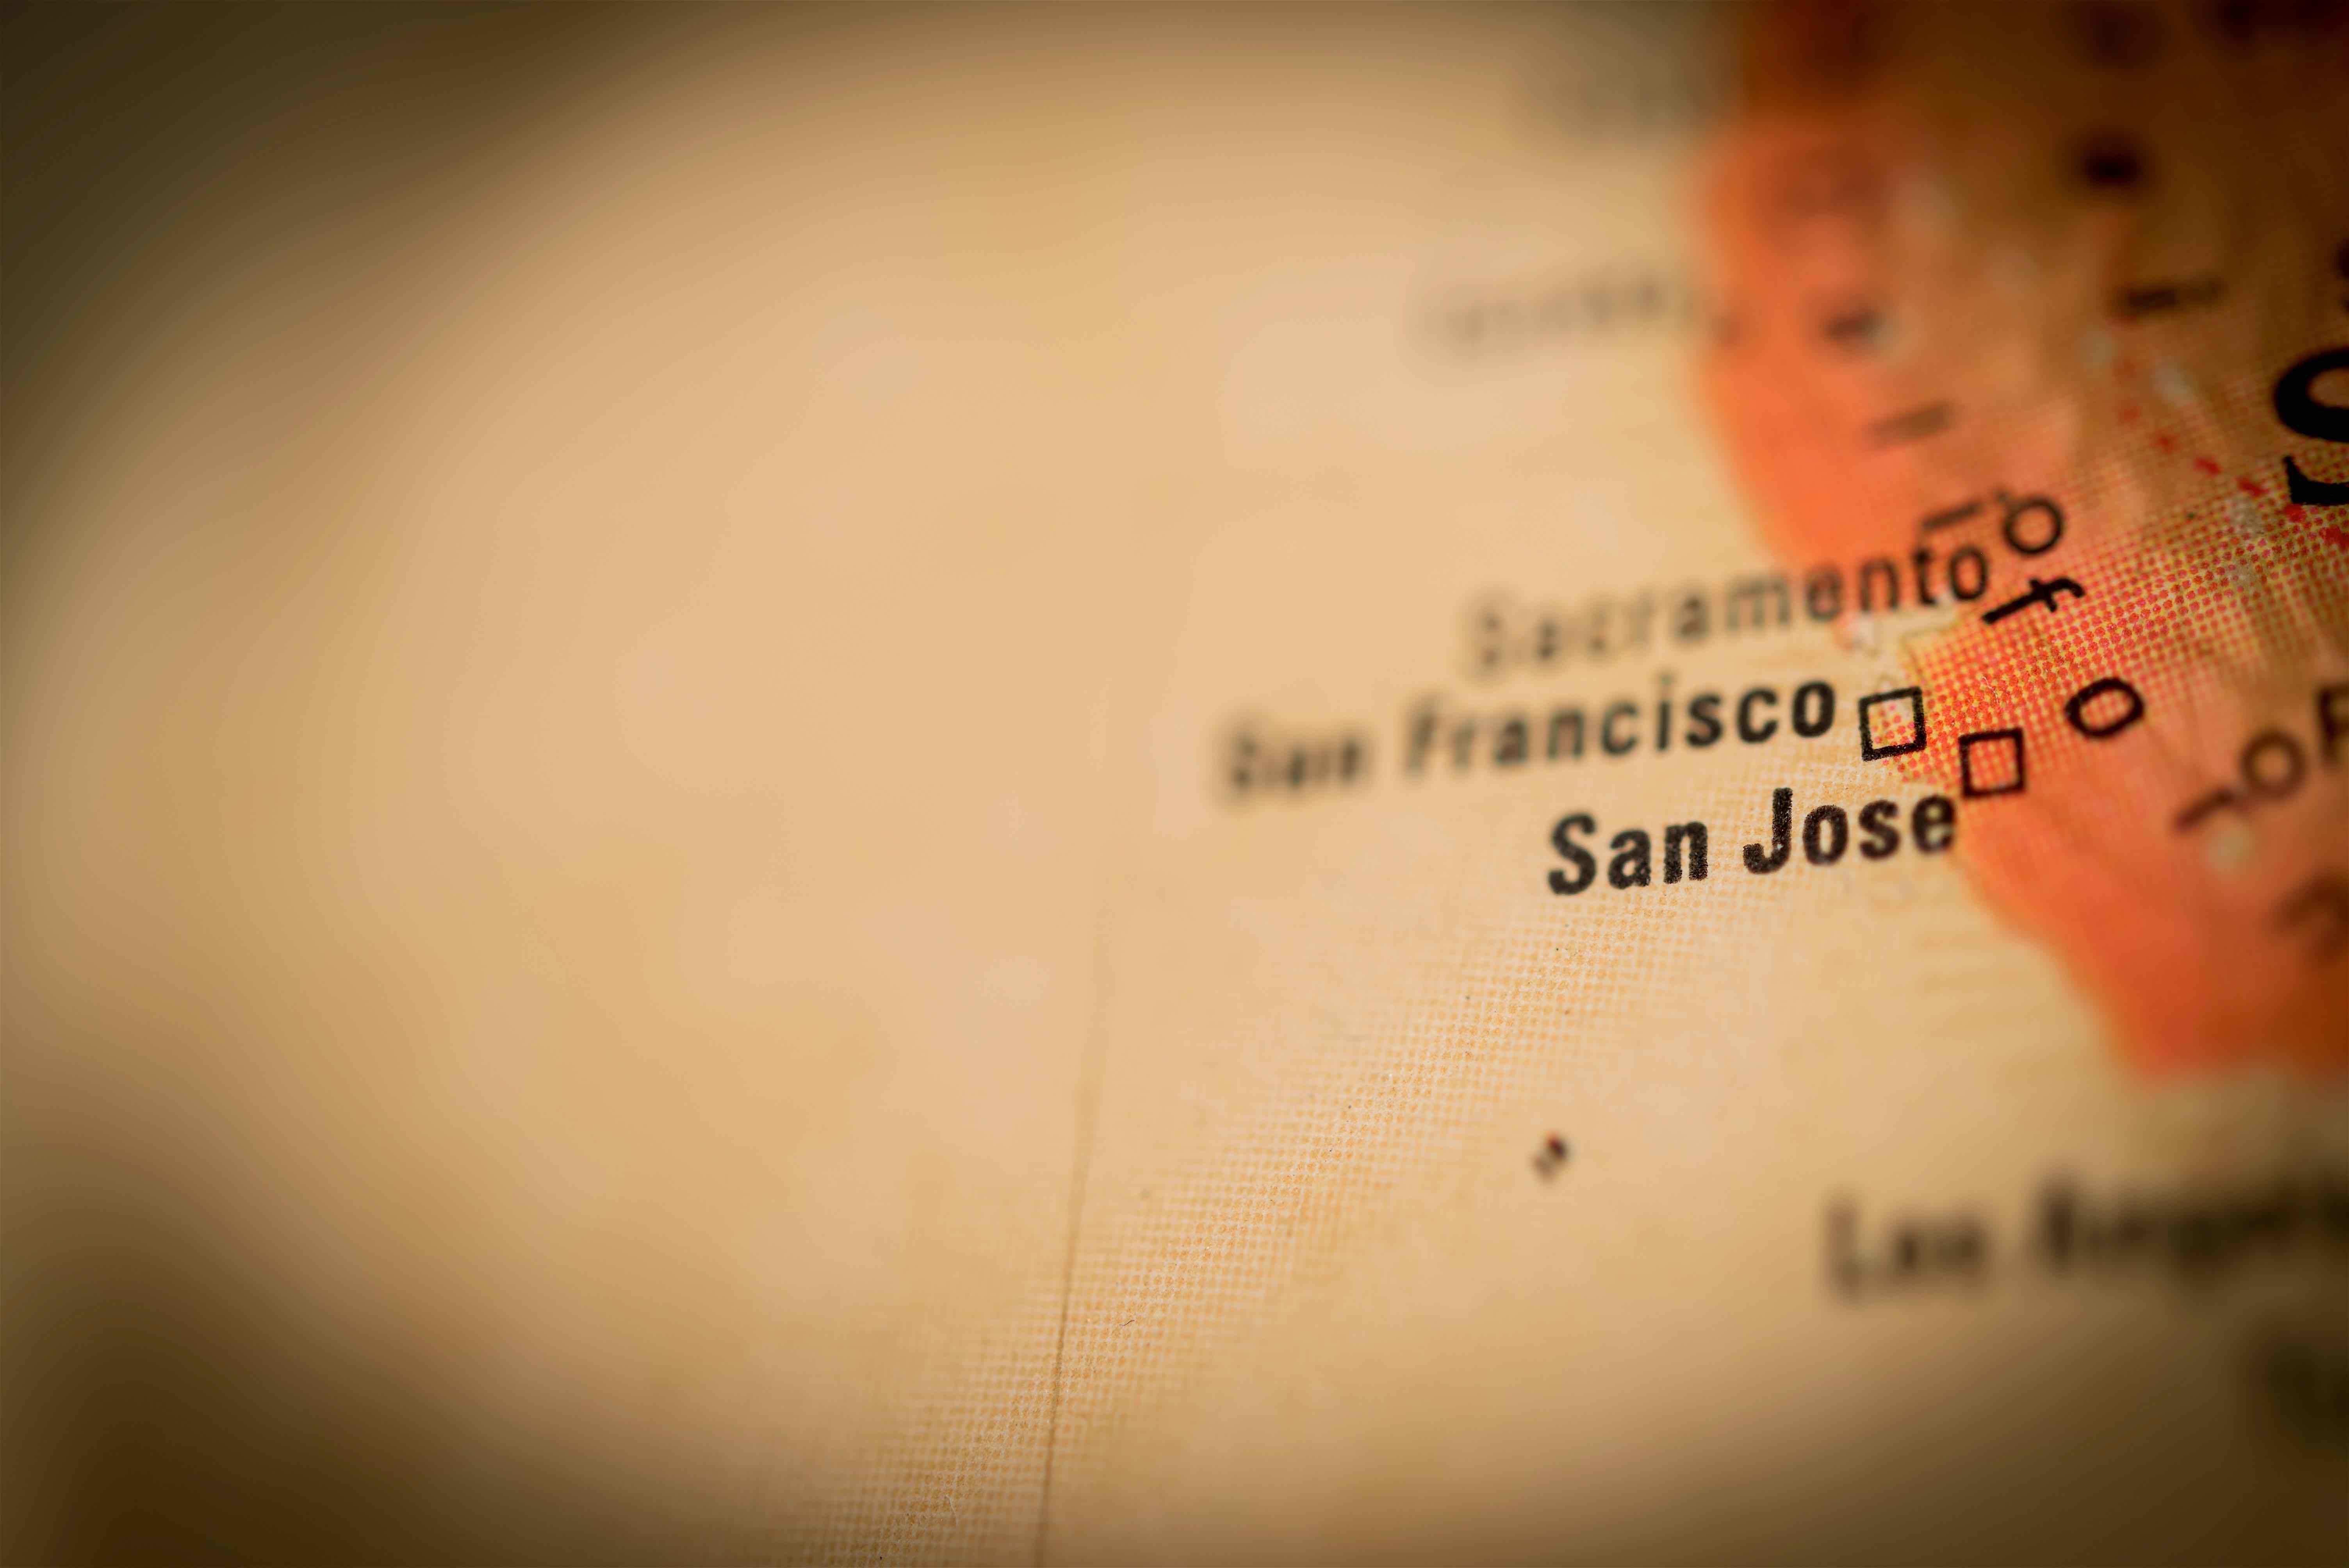 1.) San Jose, CA